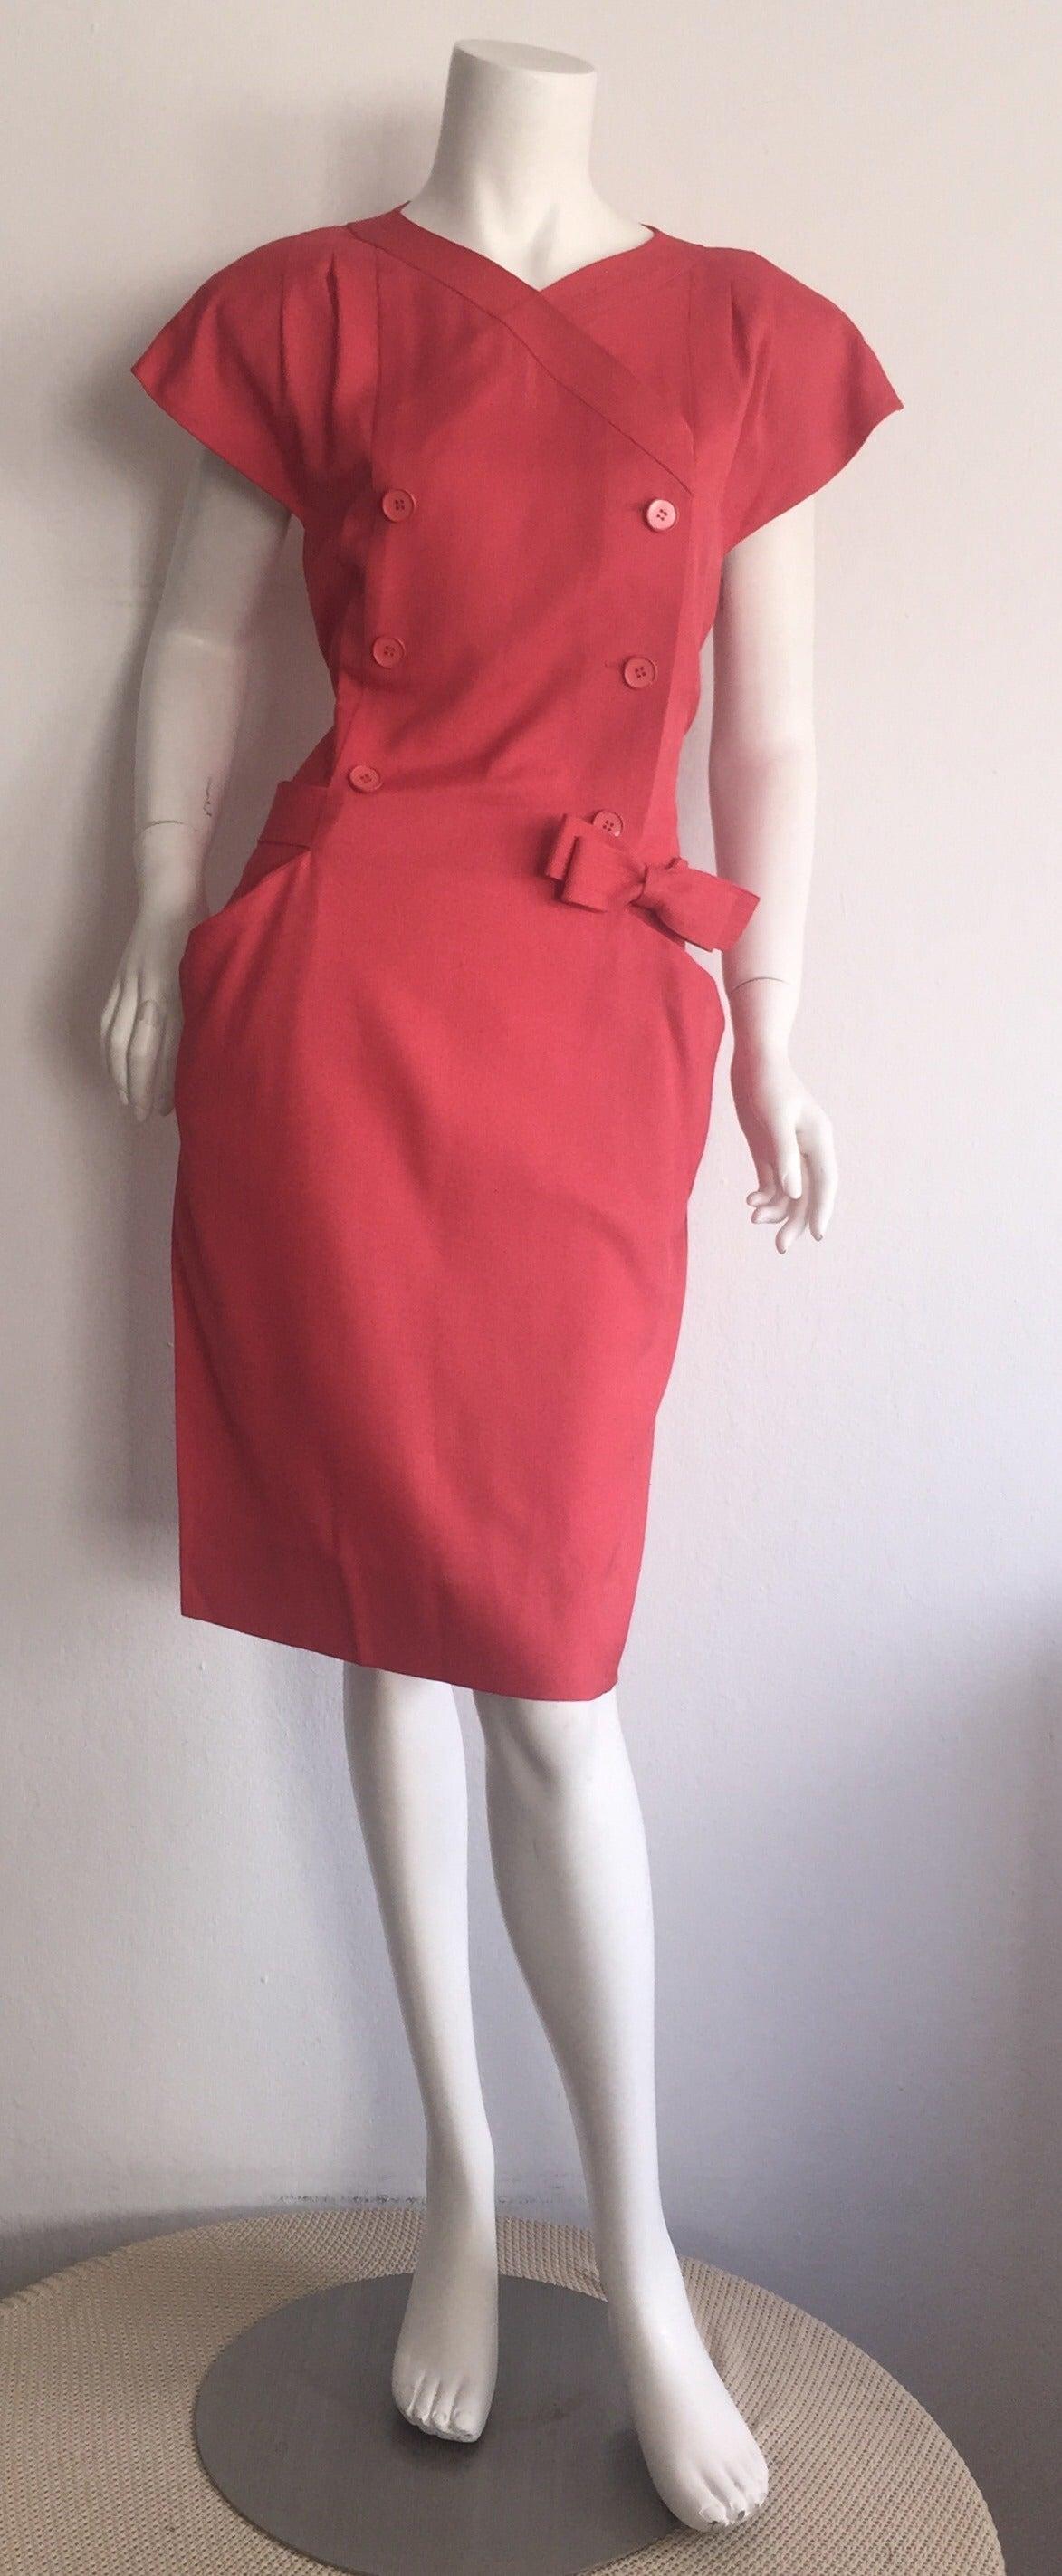 Vintage Nina Ricci Raspberry Pink Double Breasted Dress w/ Pockets + Bow Belt 7